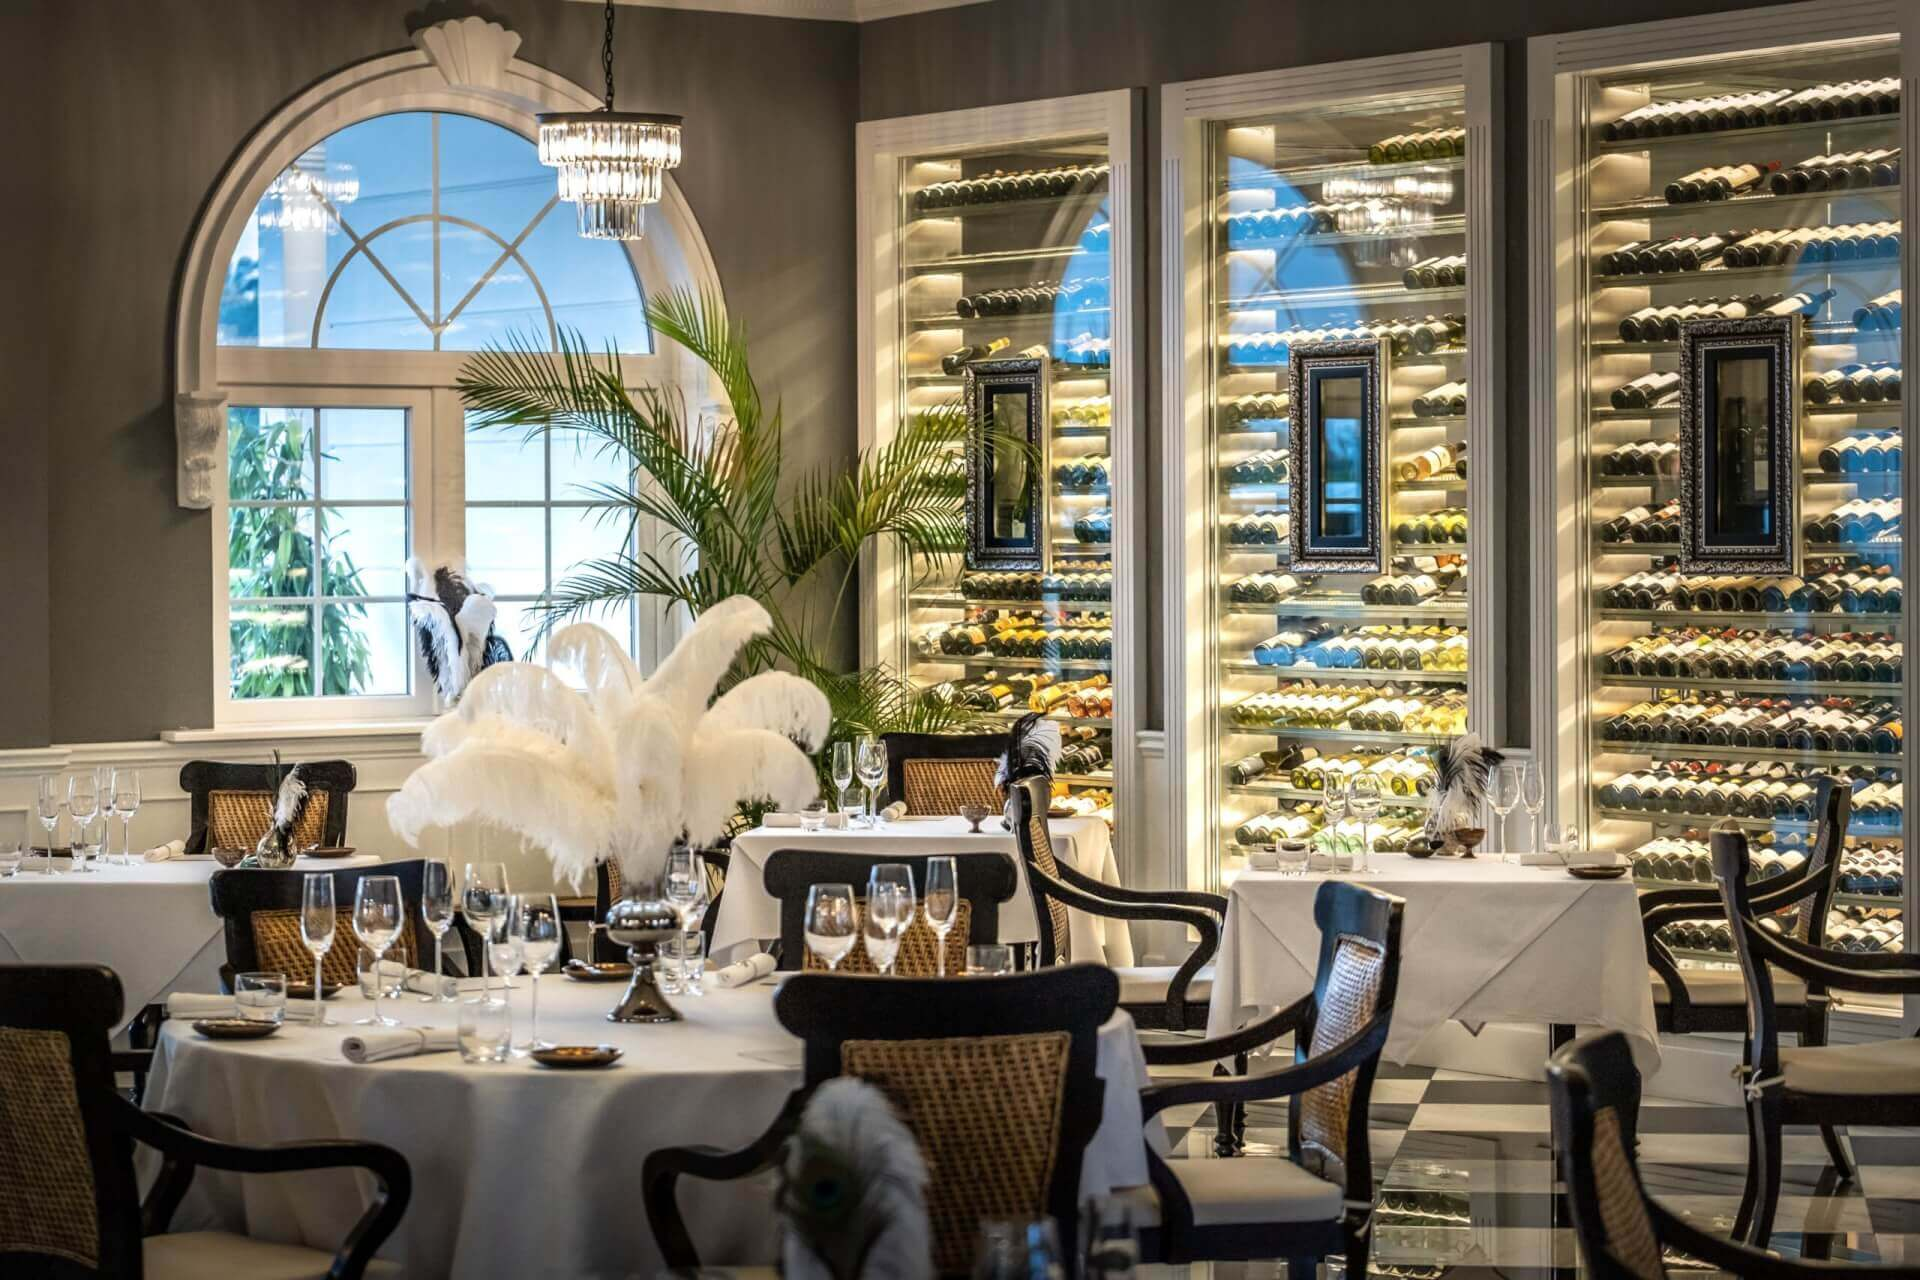 Aperitif Restaurant & Bar with Special Degustation Menu